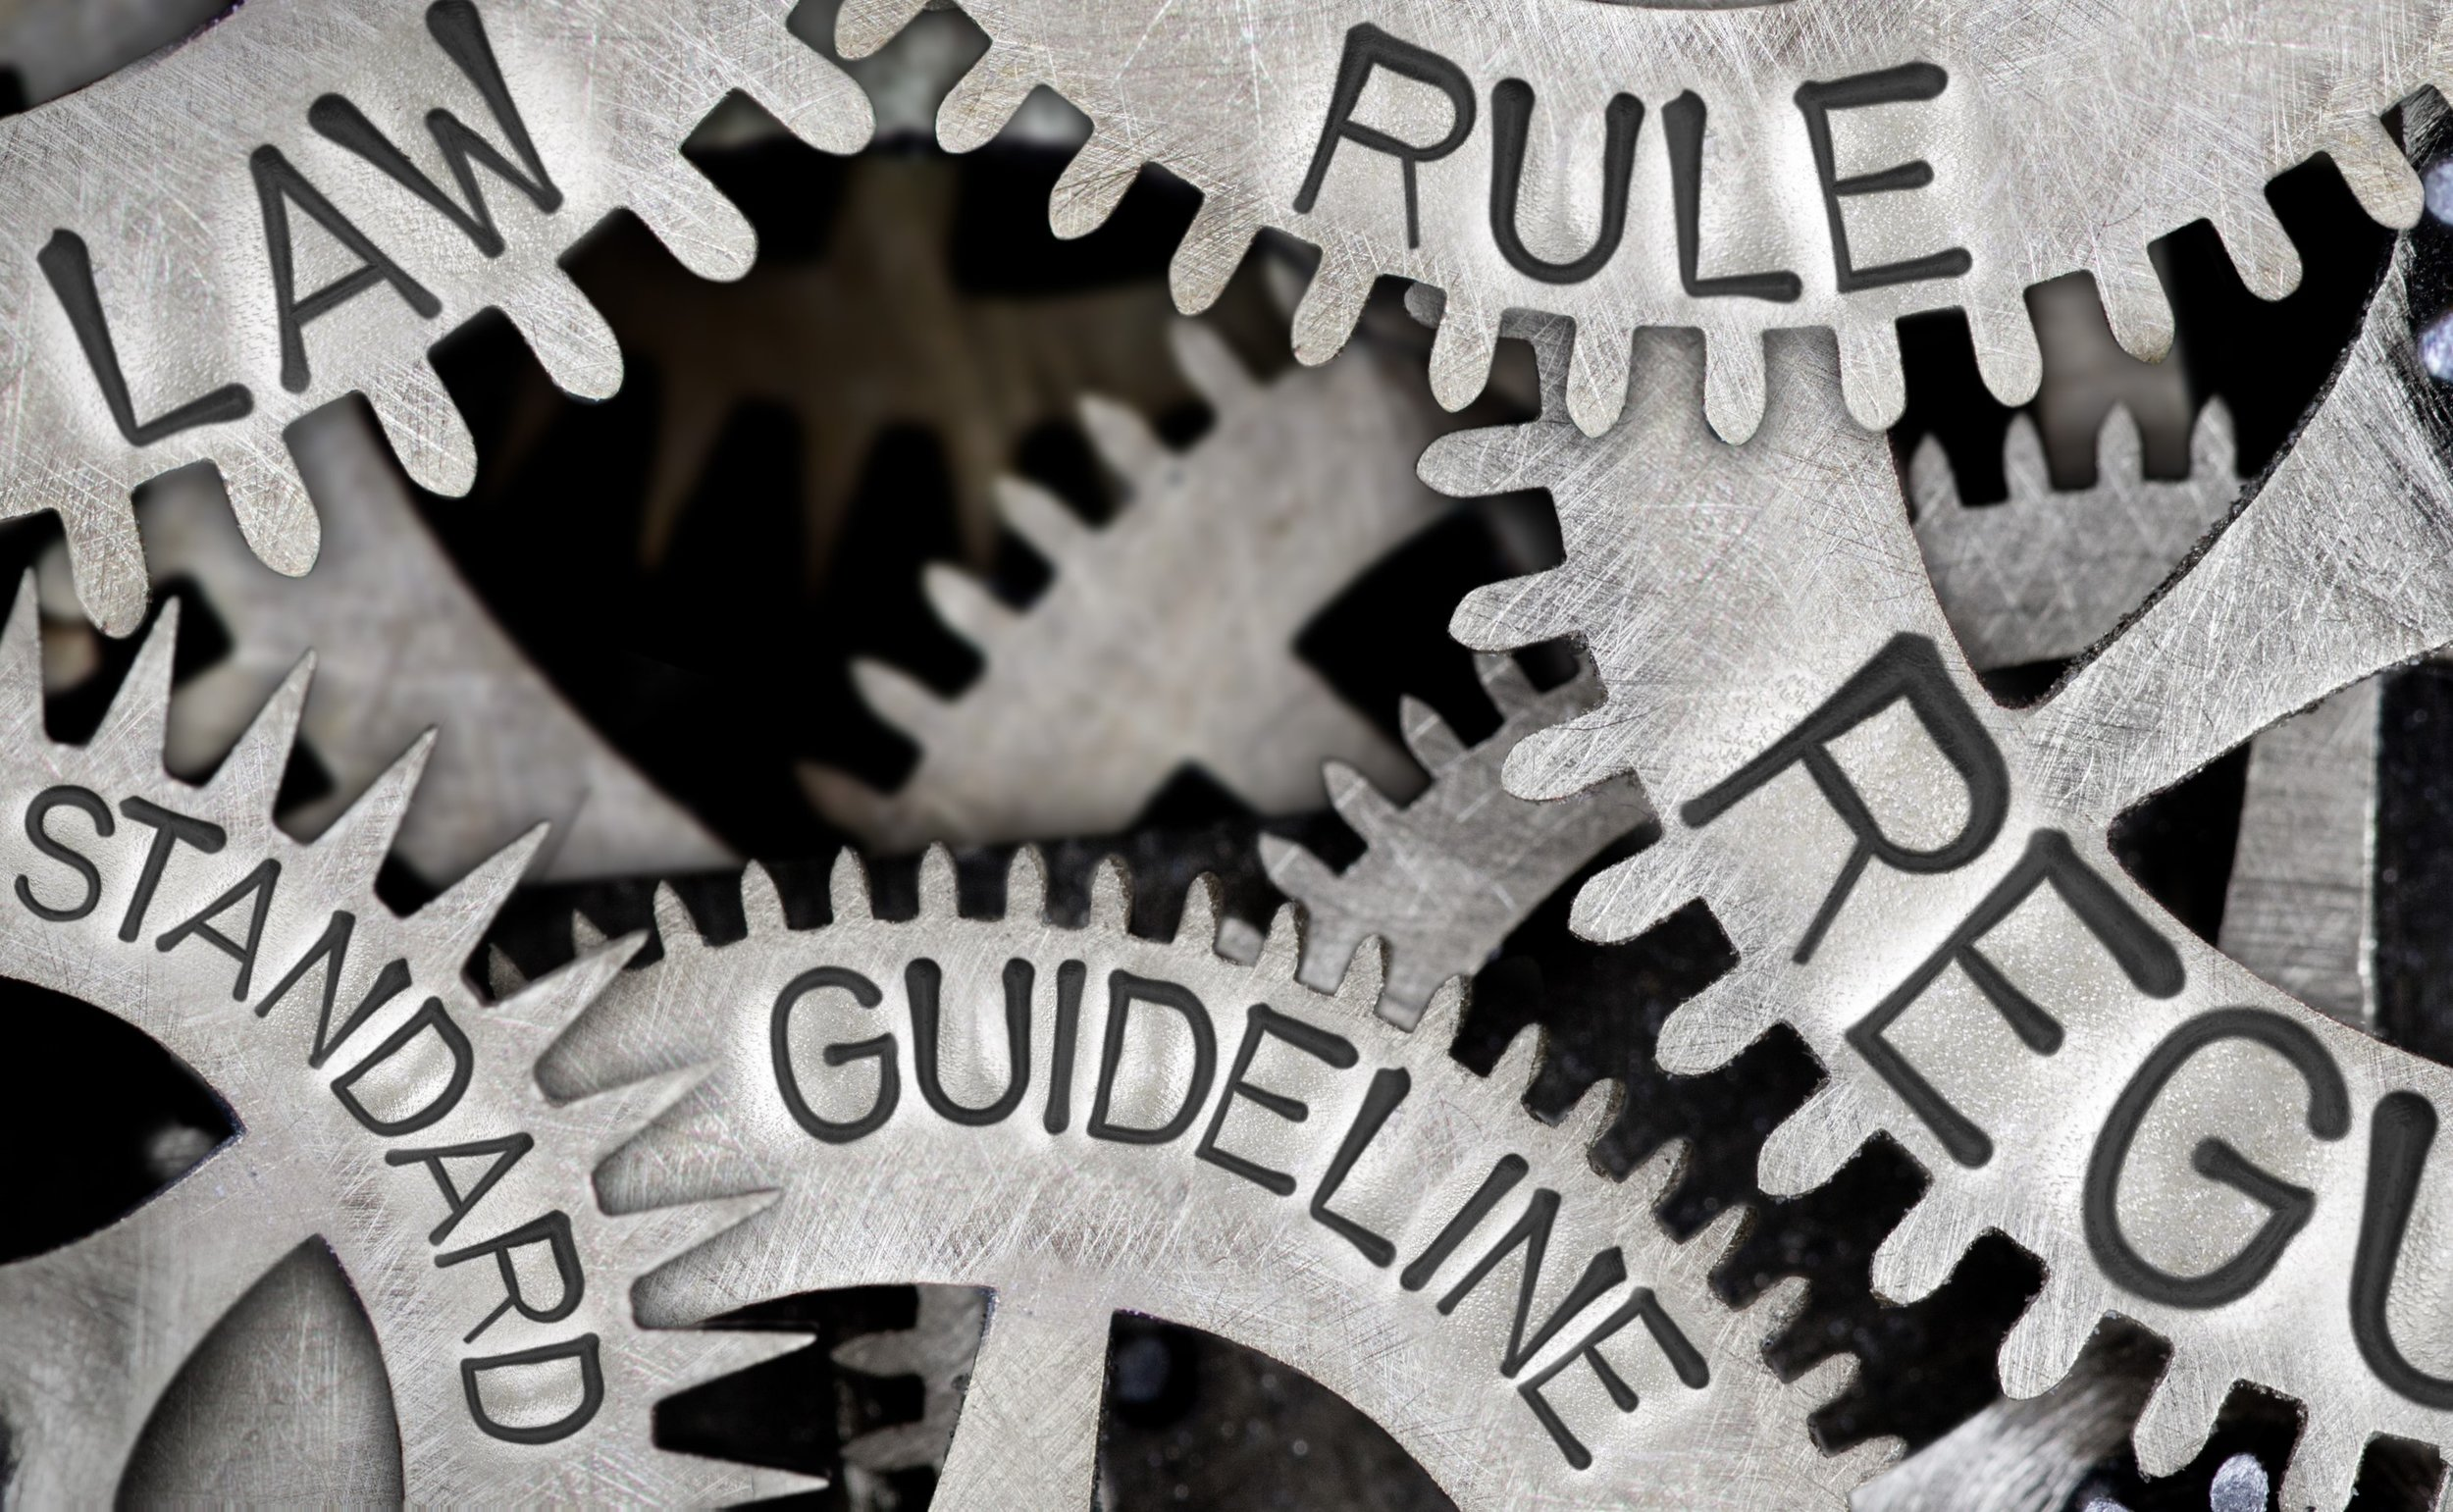 Agilis - Human Factors Regulatory Guidance